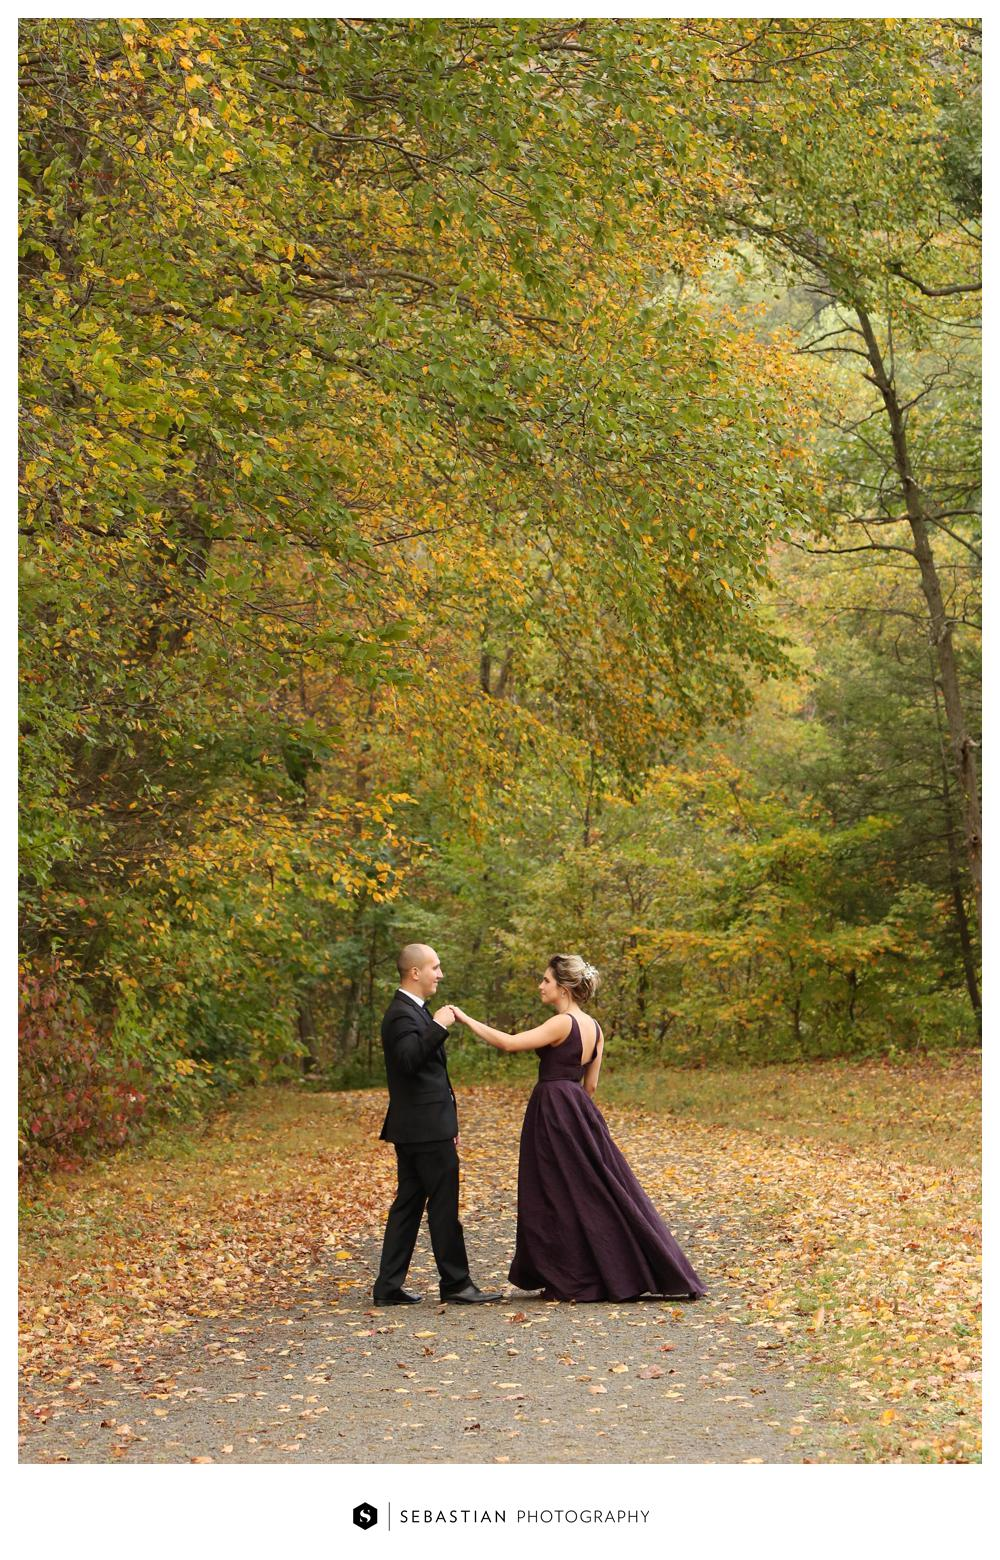 Sebastian Photography_CT Wedding Photographer_Castle Craig_CT Engagement Photographer_1003.jpg